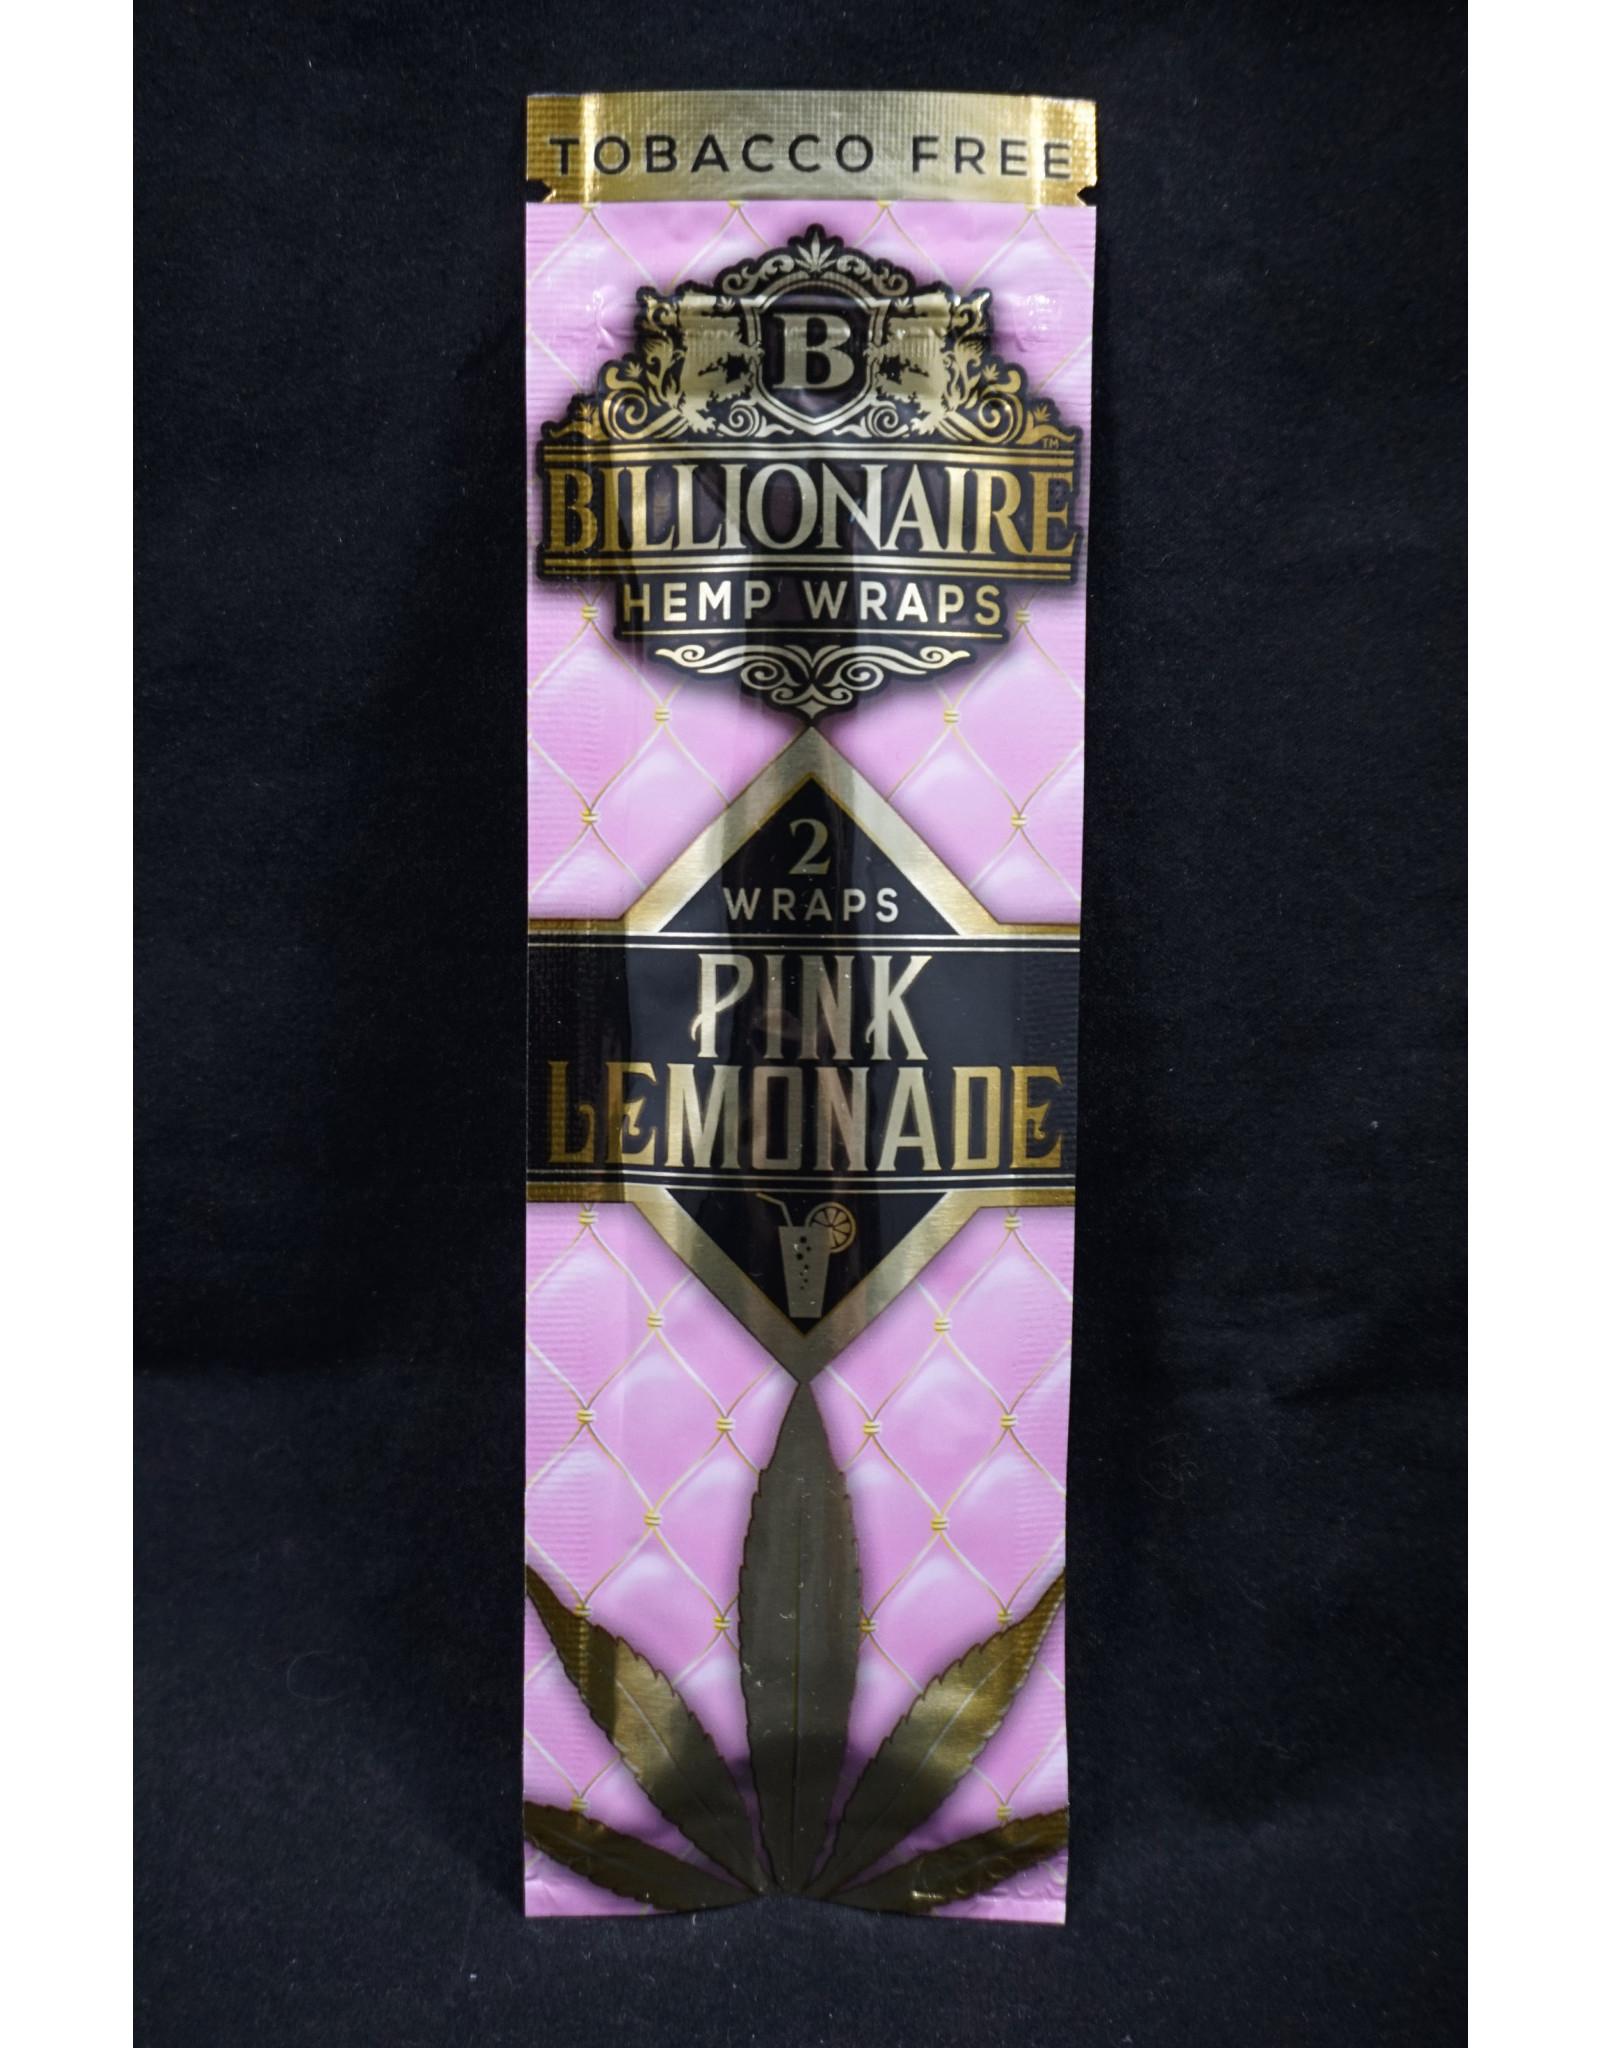 Billionaire Hemp Wraps - Pink Lemonade